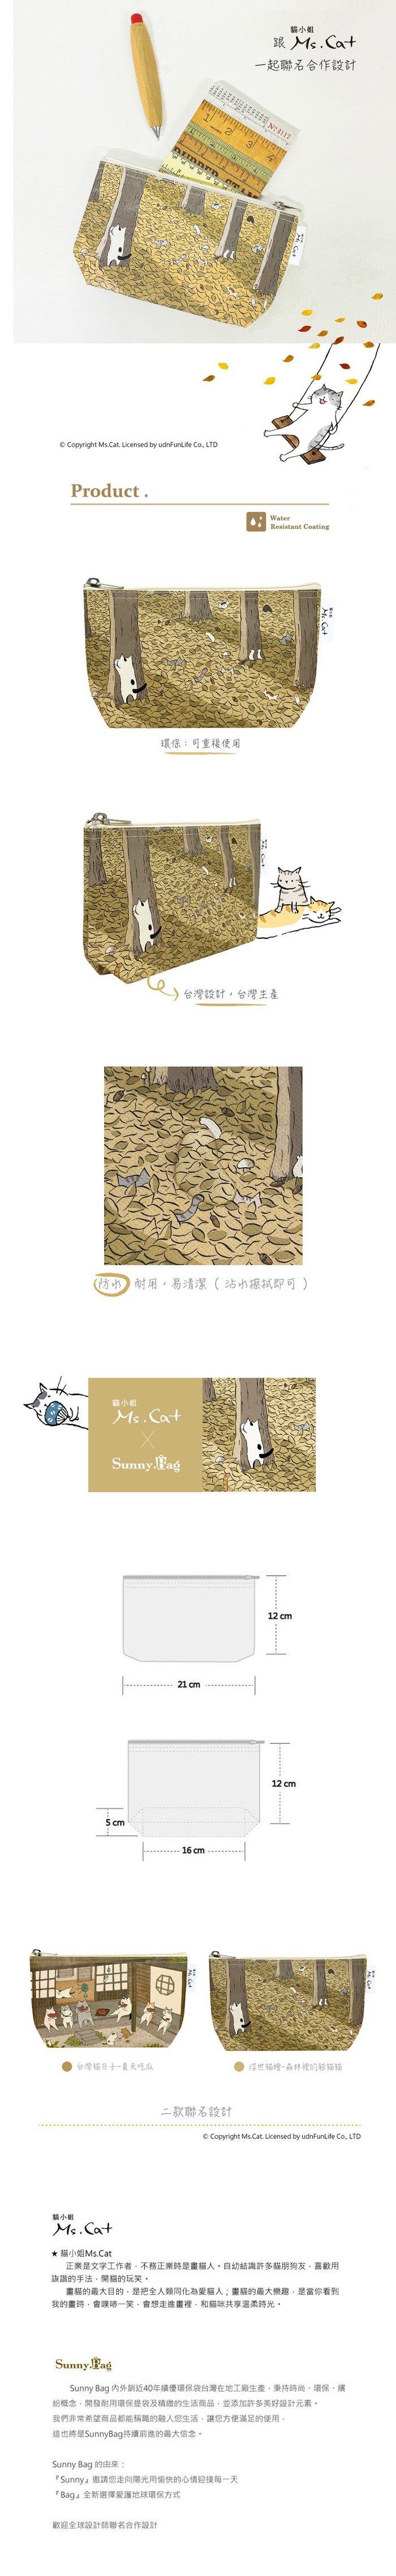 Sunny Bag x 貓小姐Ms.Cat-化妝包_浮世貓繪-森林裡的躲貓貓